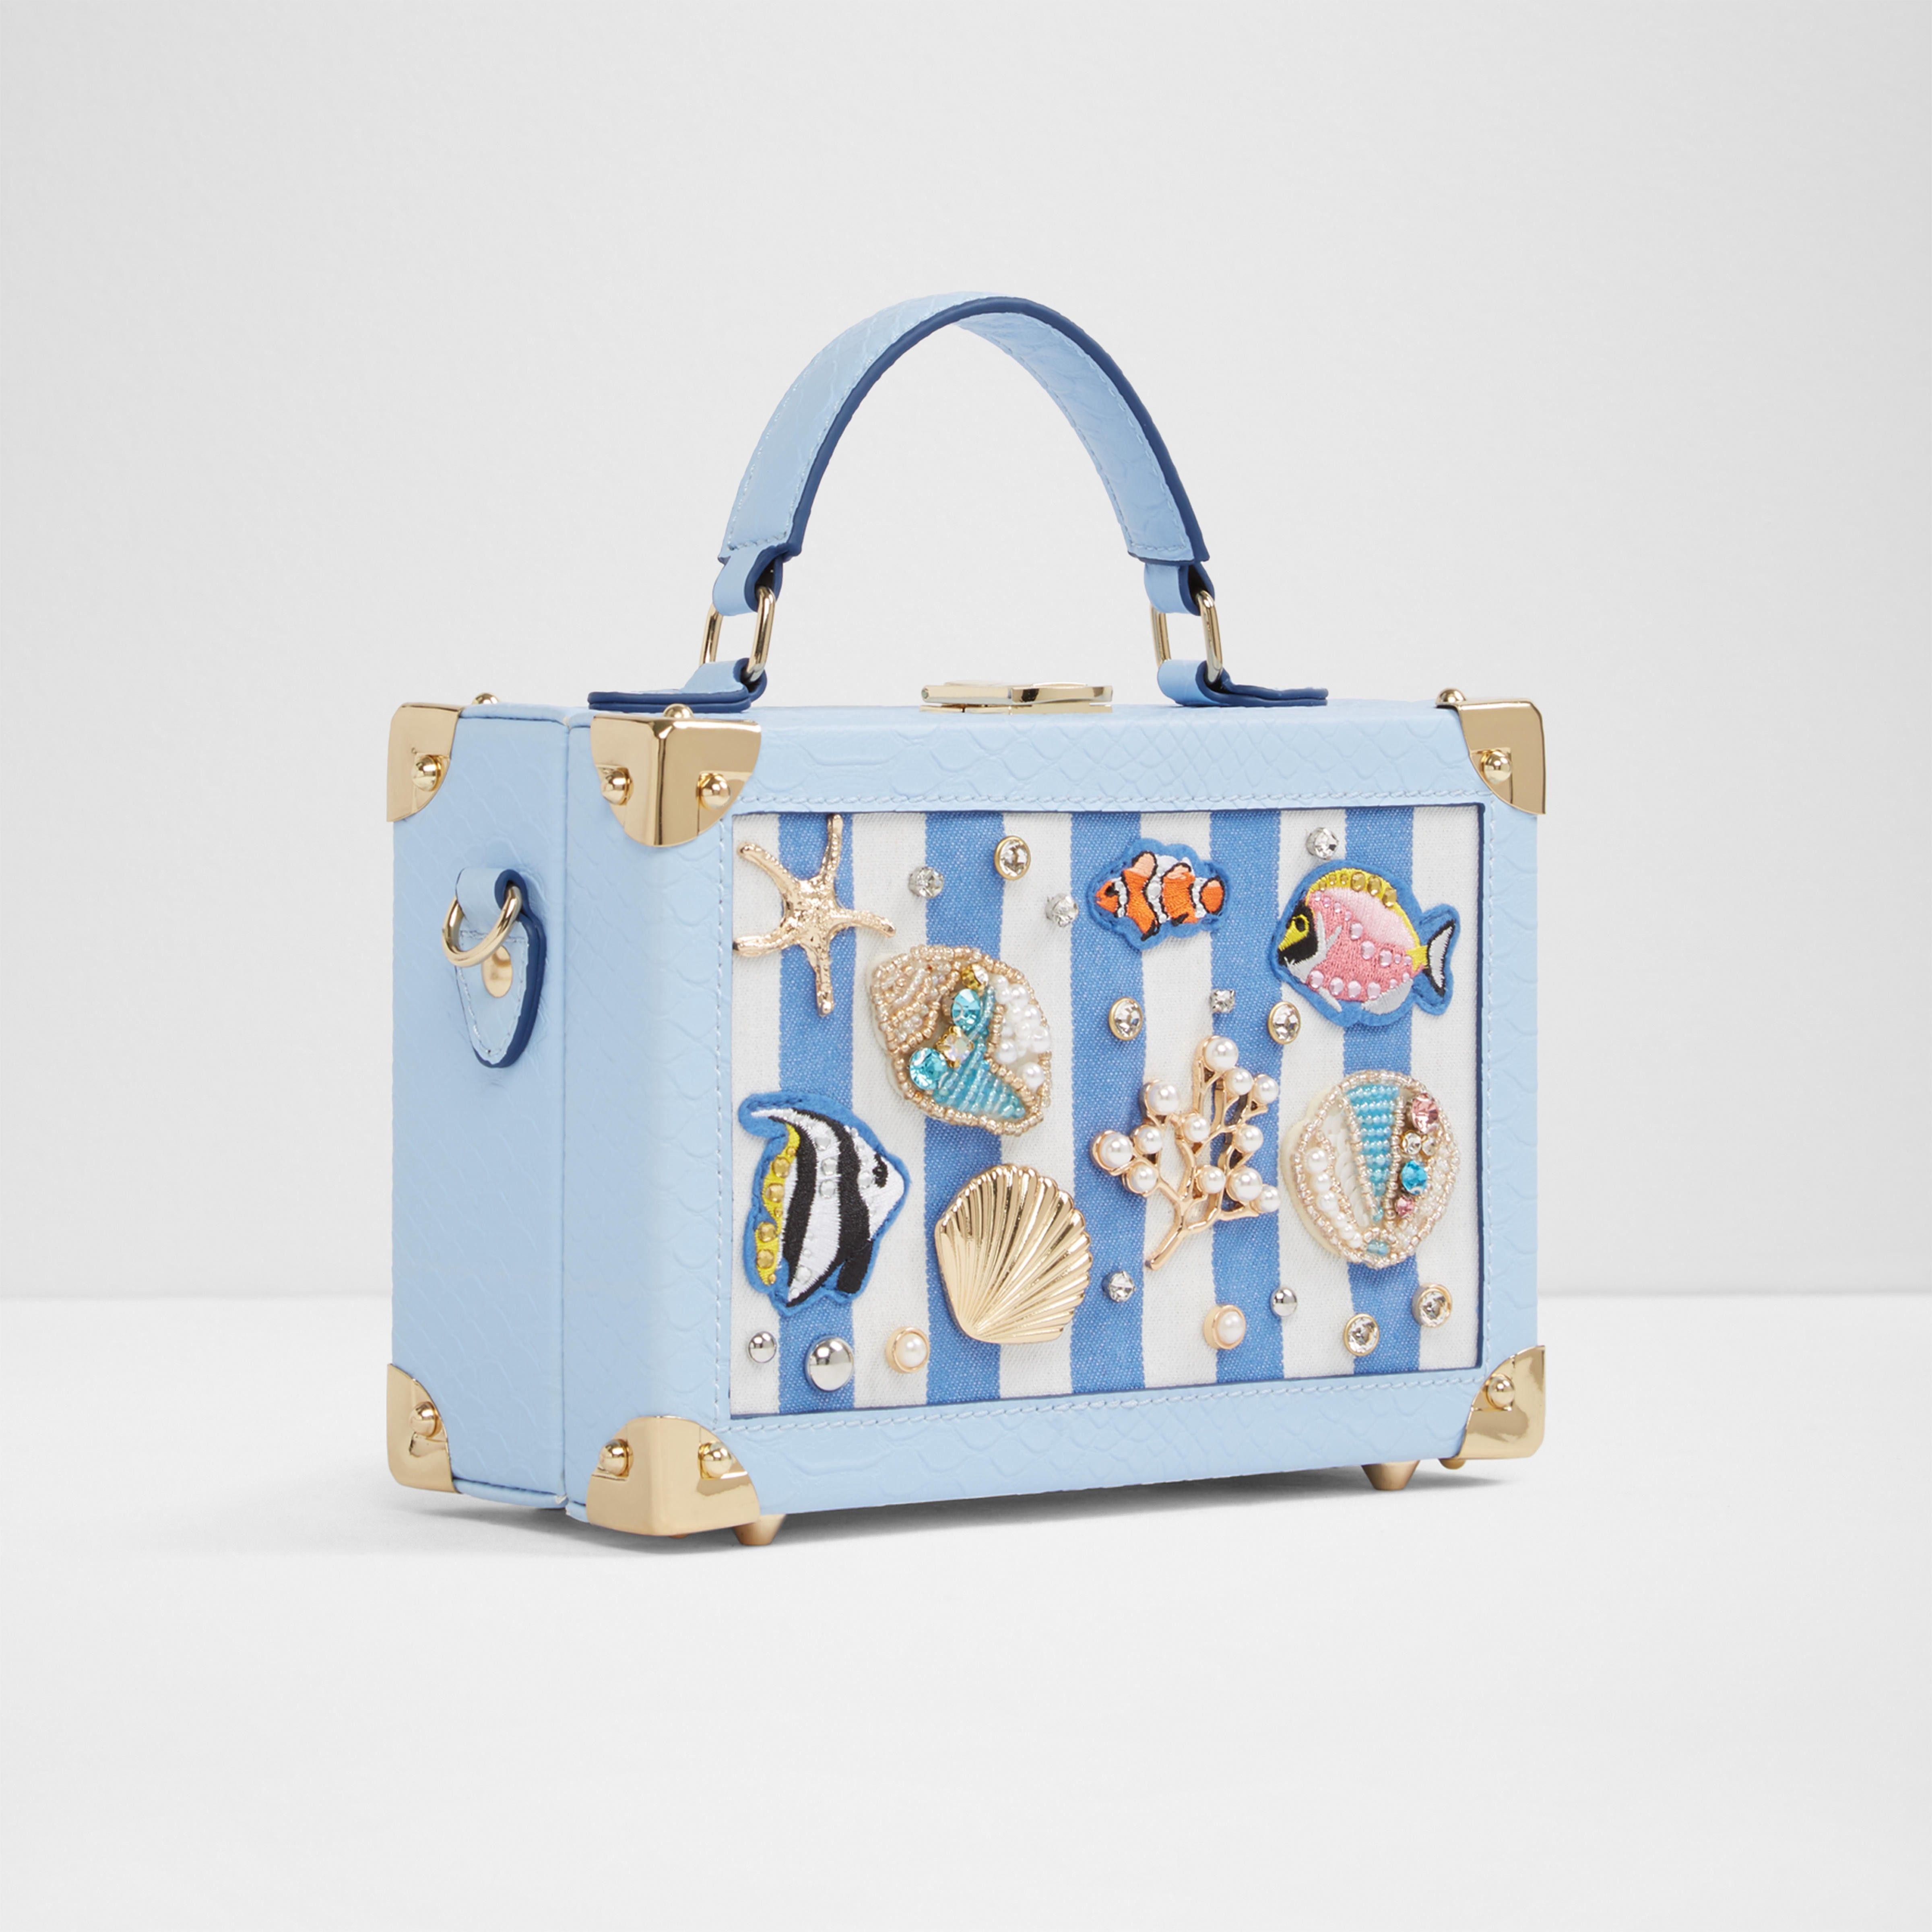 78ee379825b Aldo Deroland - Navy Purses And Bags